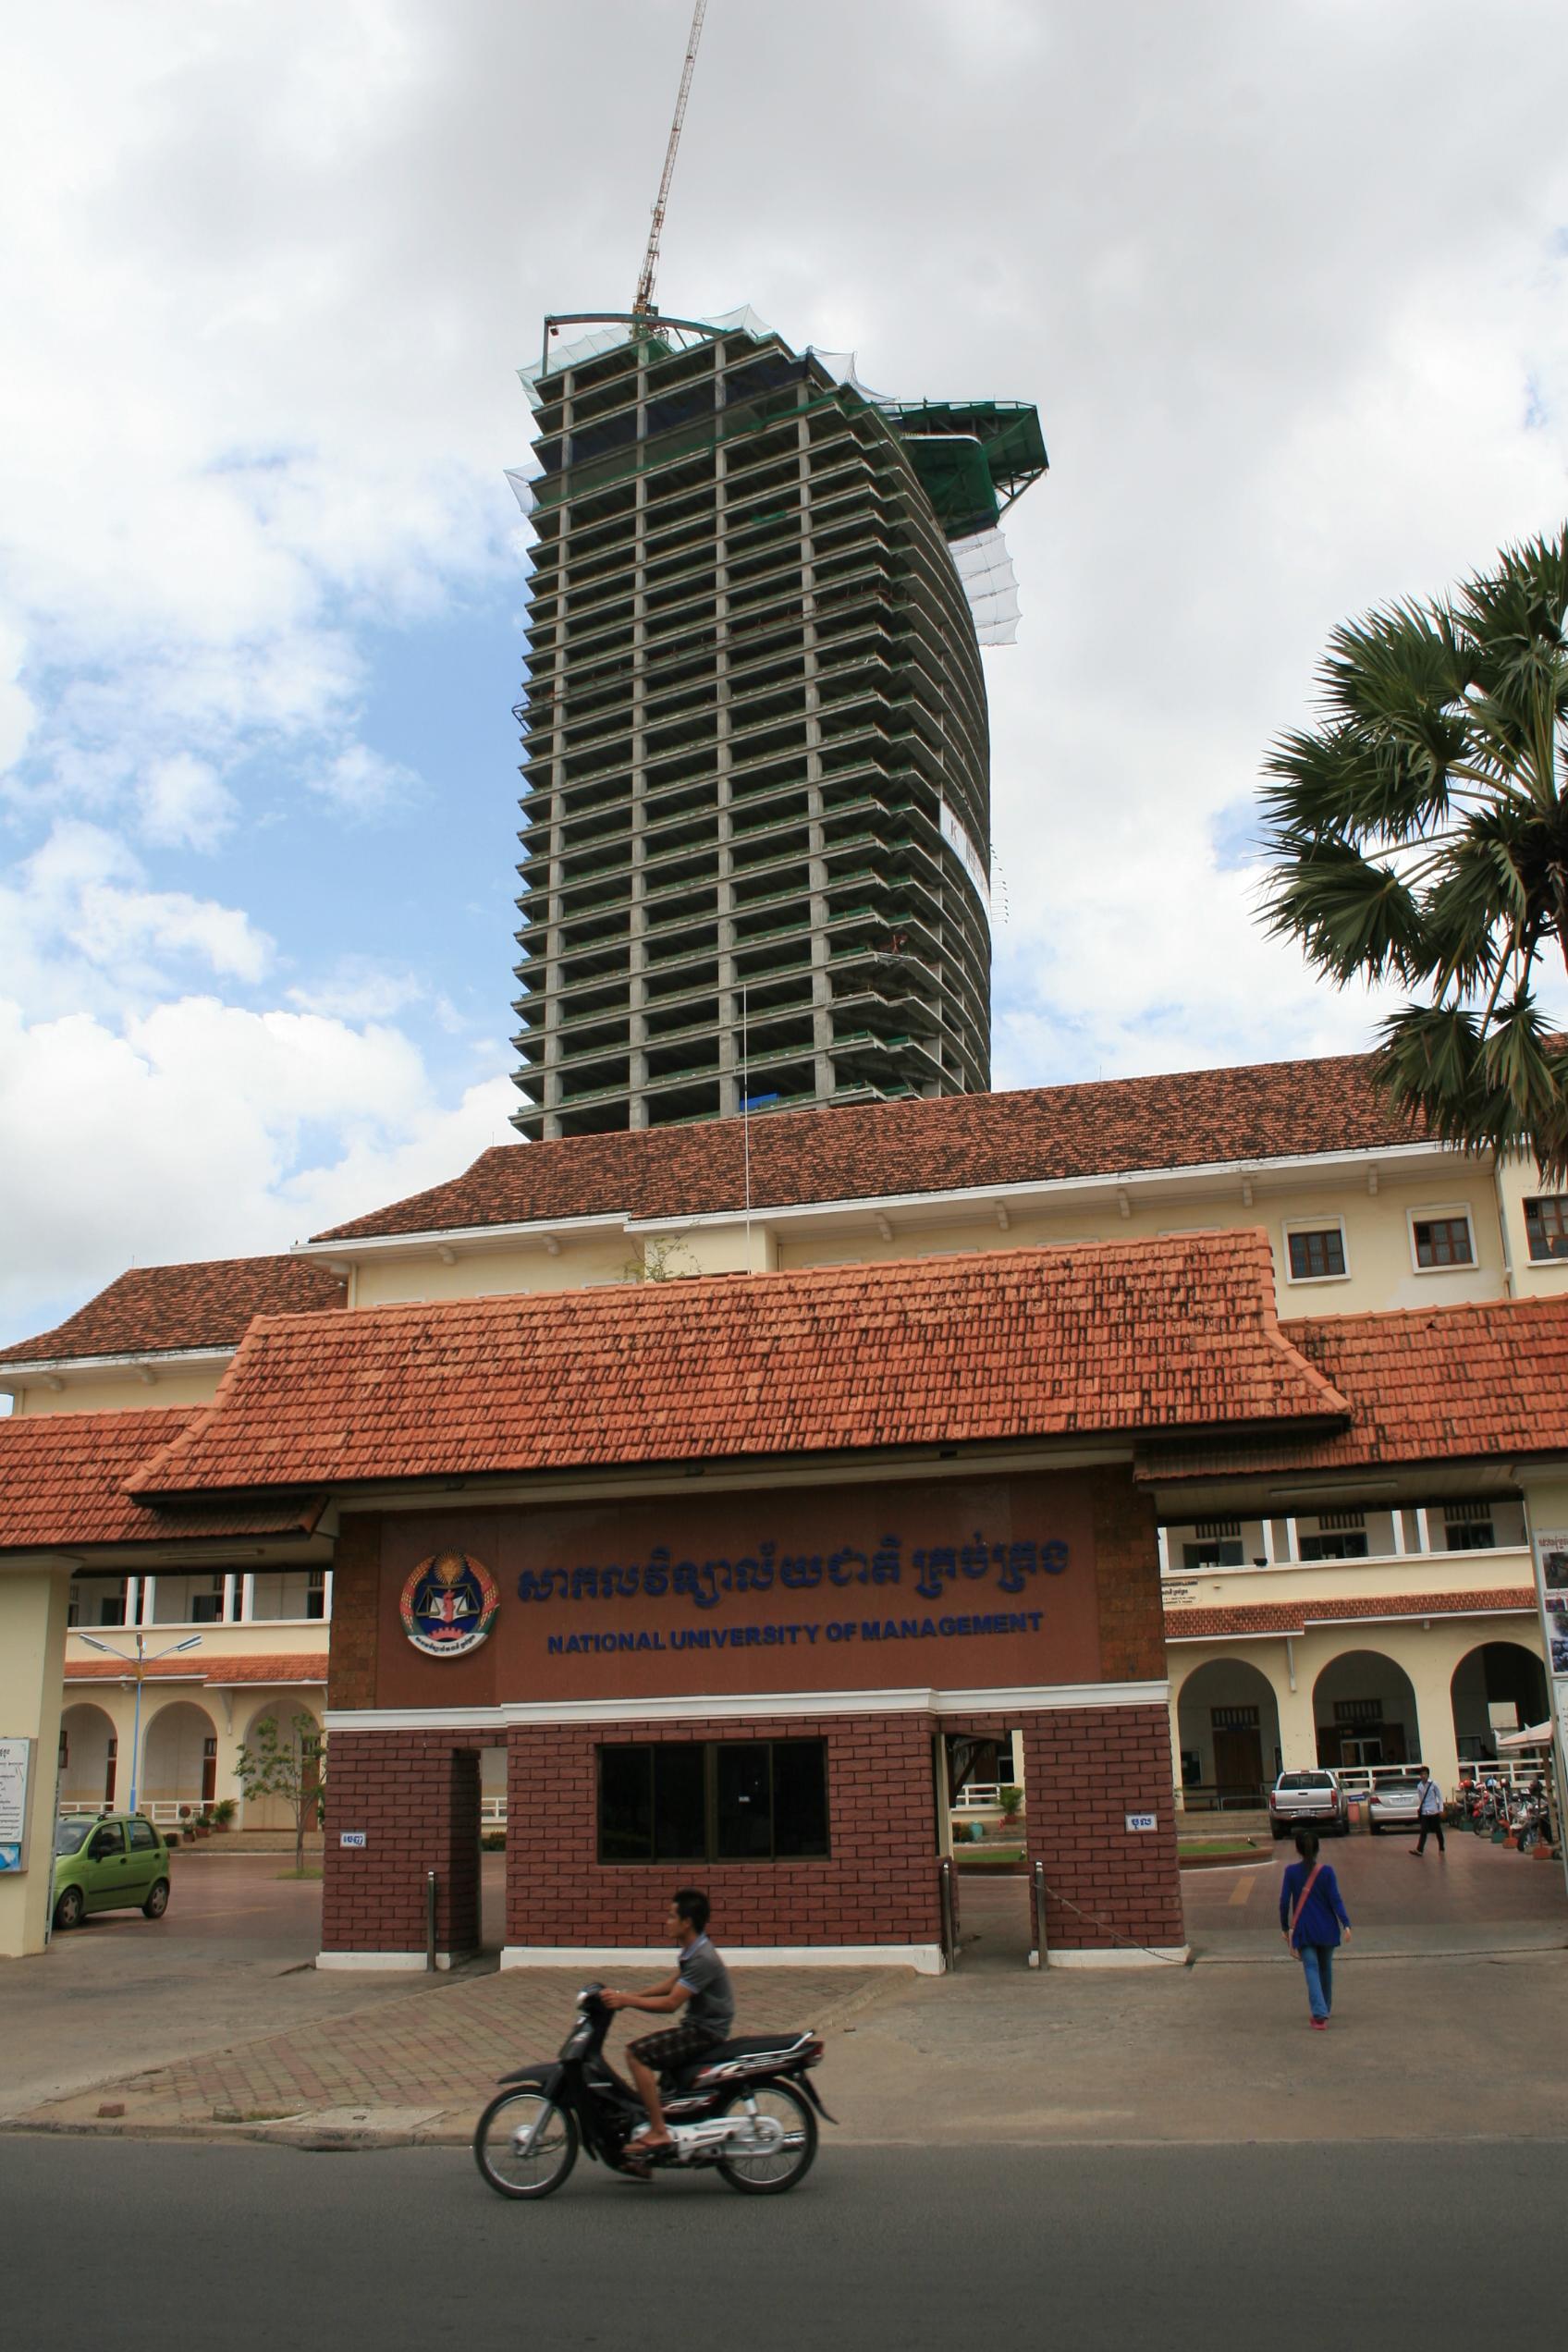 Vattanac Tower